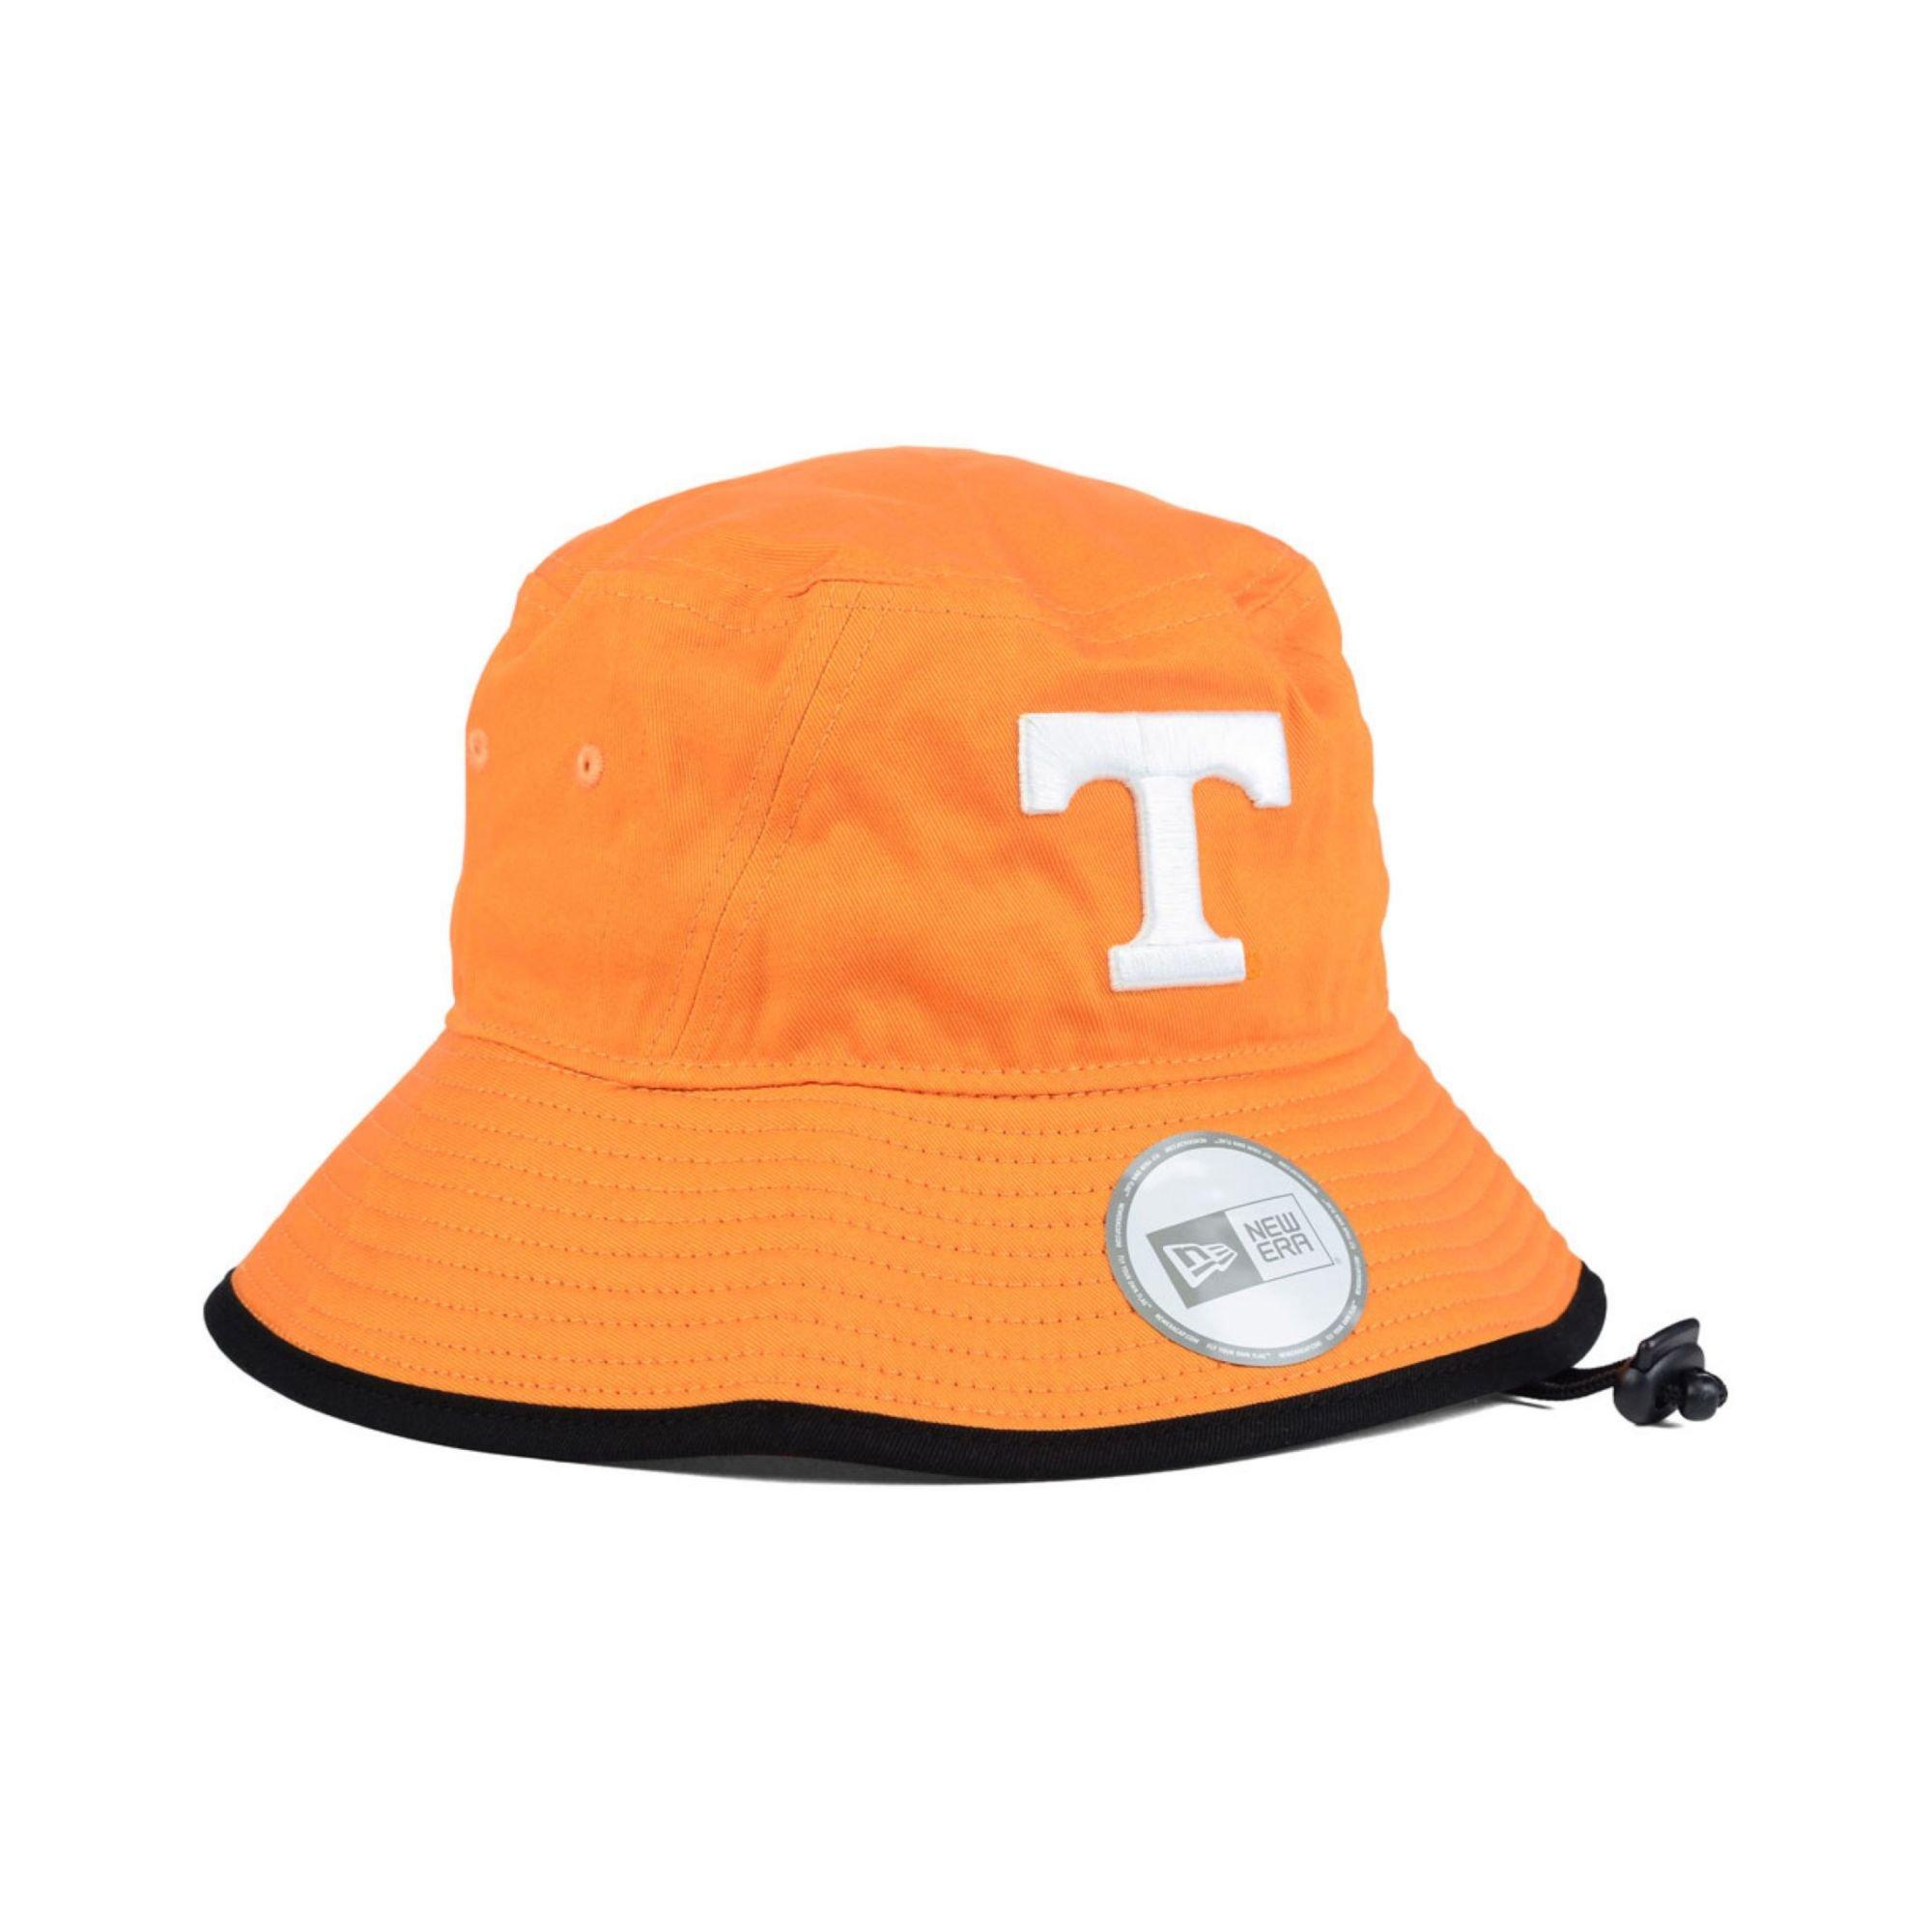 a19a555596c Lyst - KTZ Tennessee Volunteers Tip Bucket Hat in Orange for Men